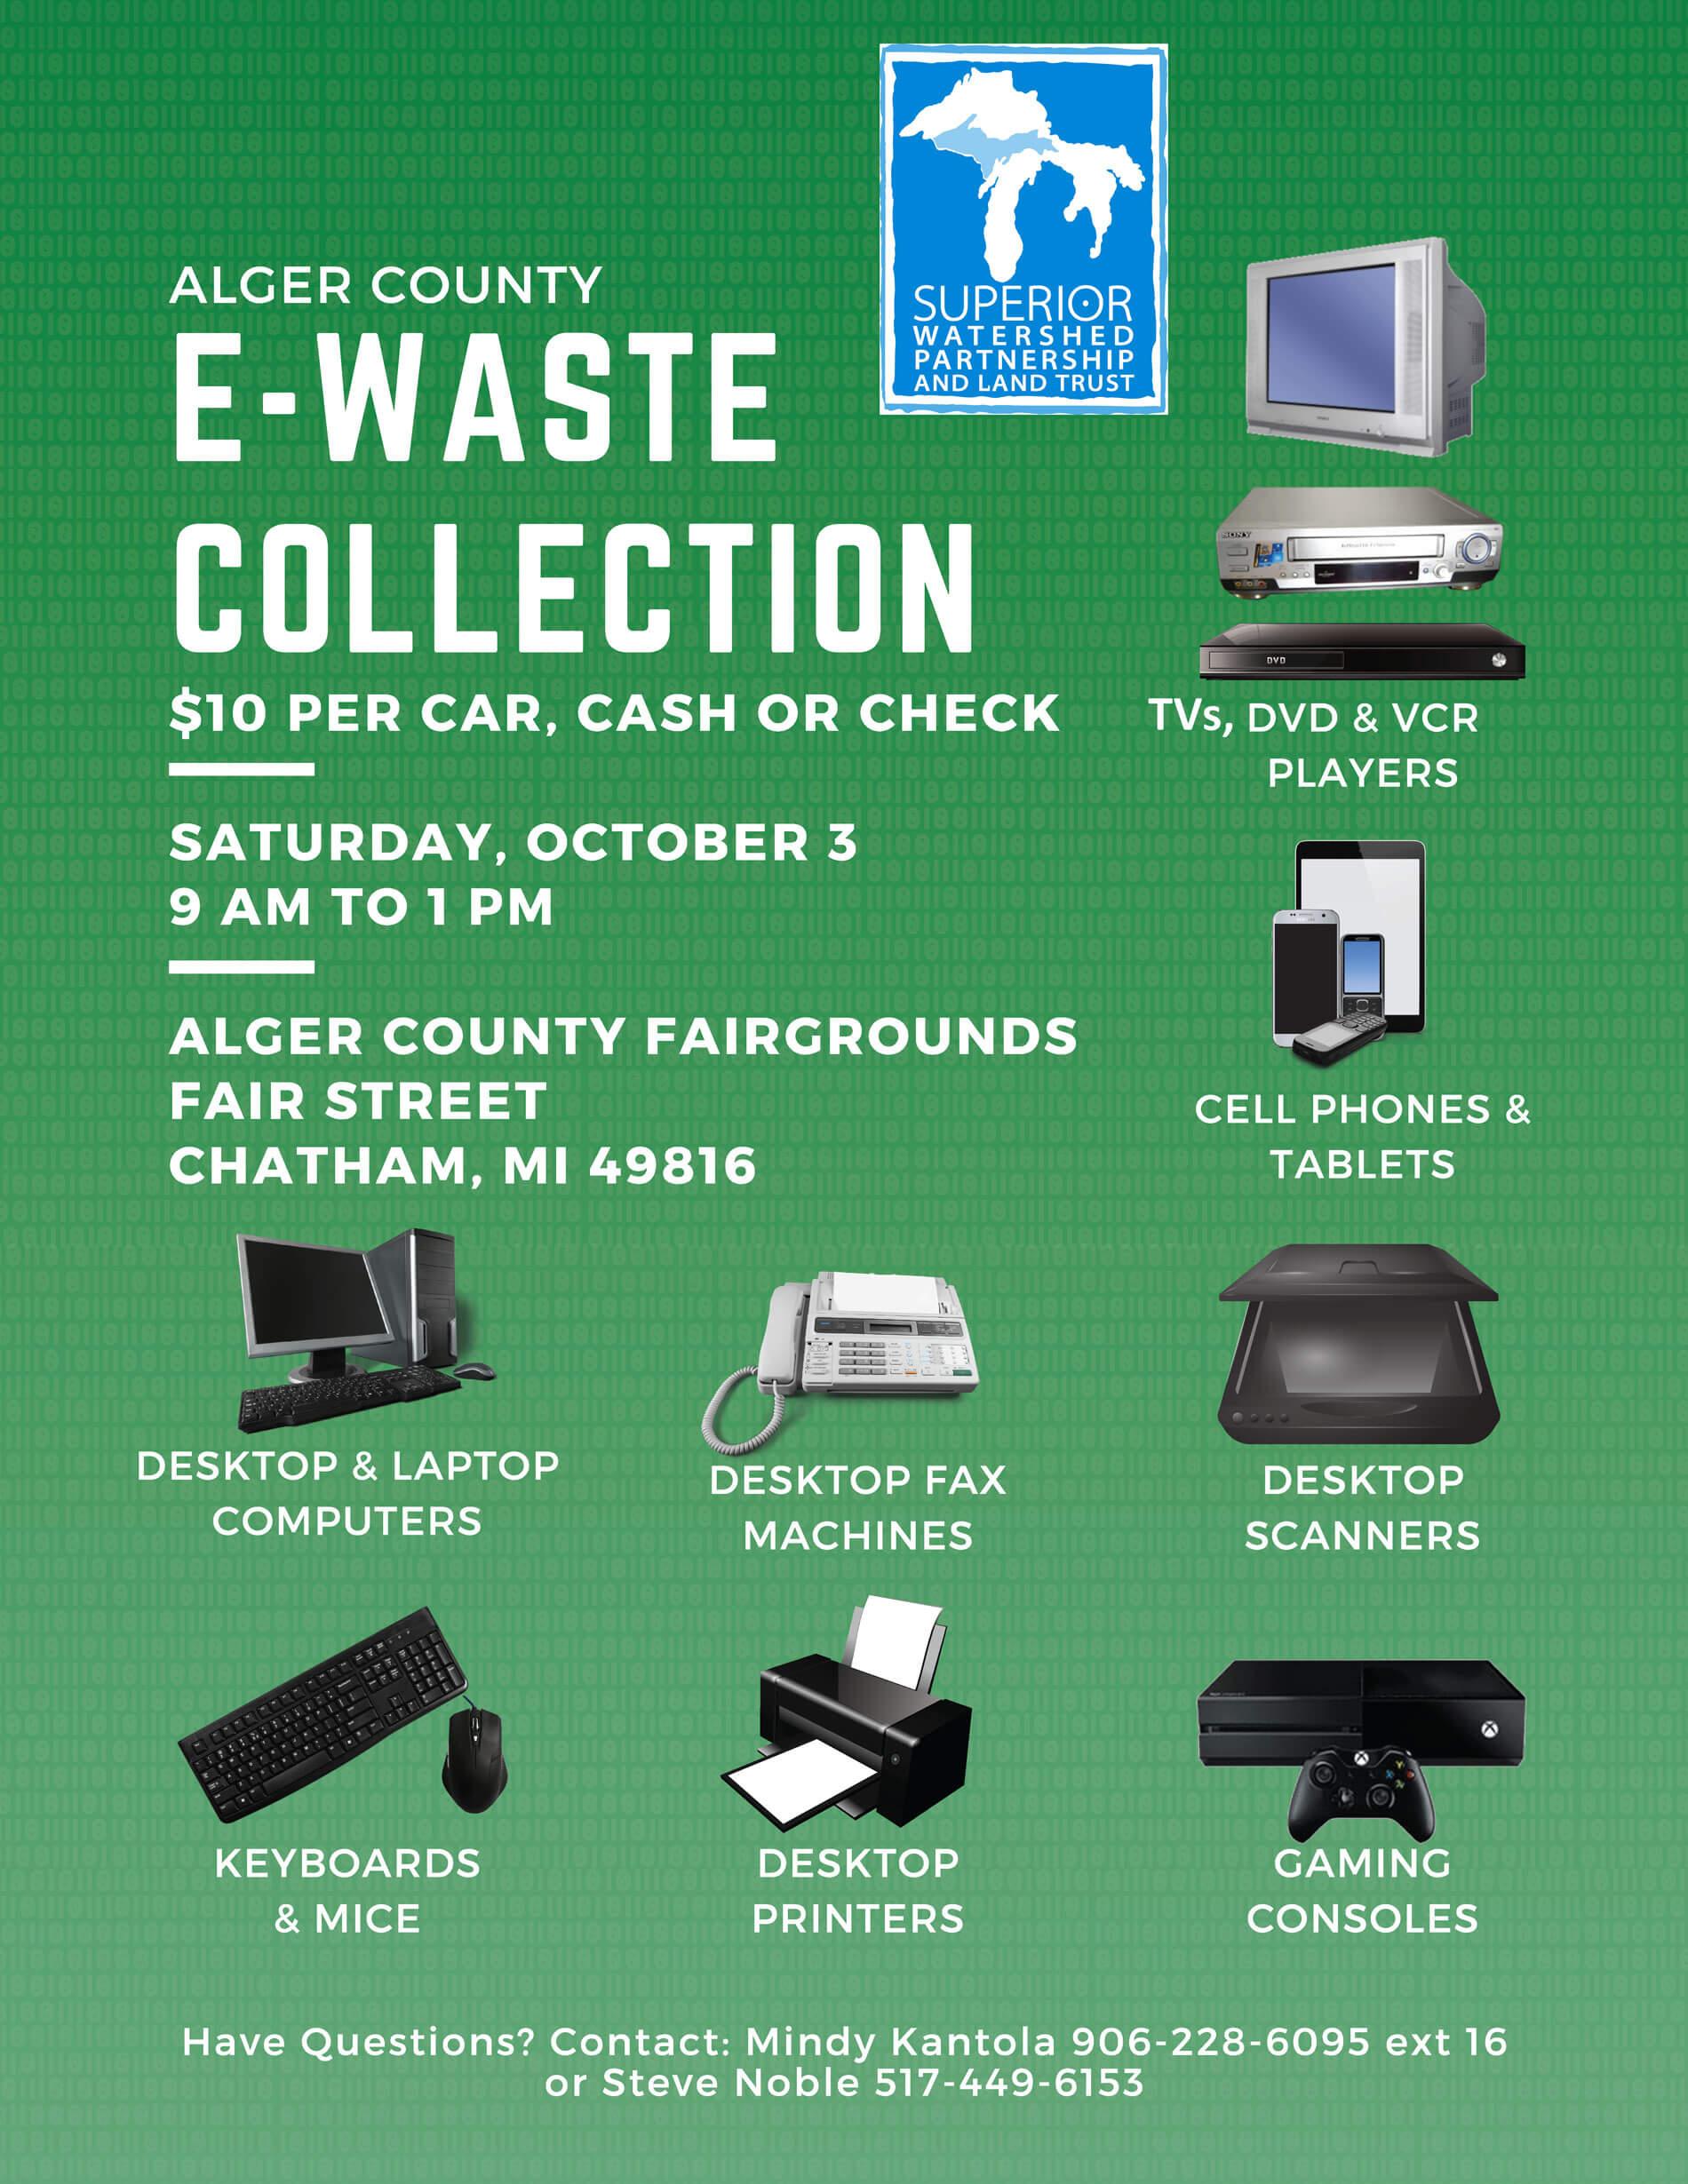 E-Waste-Event-Poster-JDK-edits